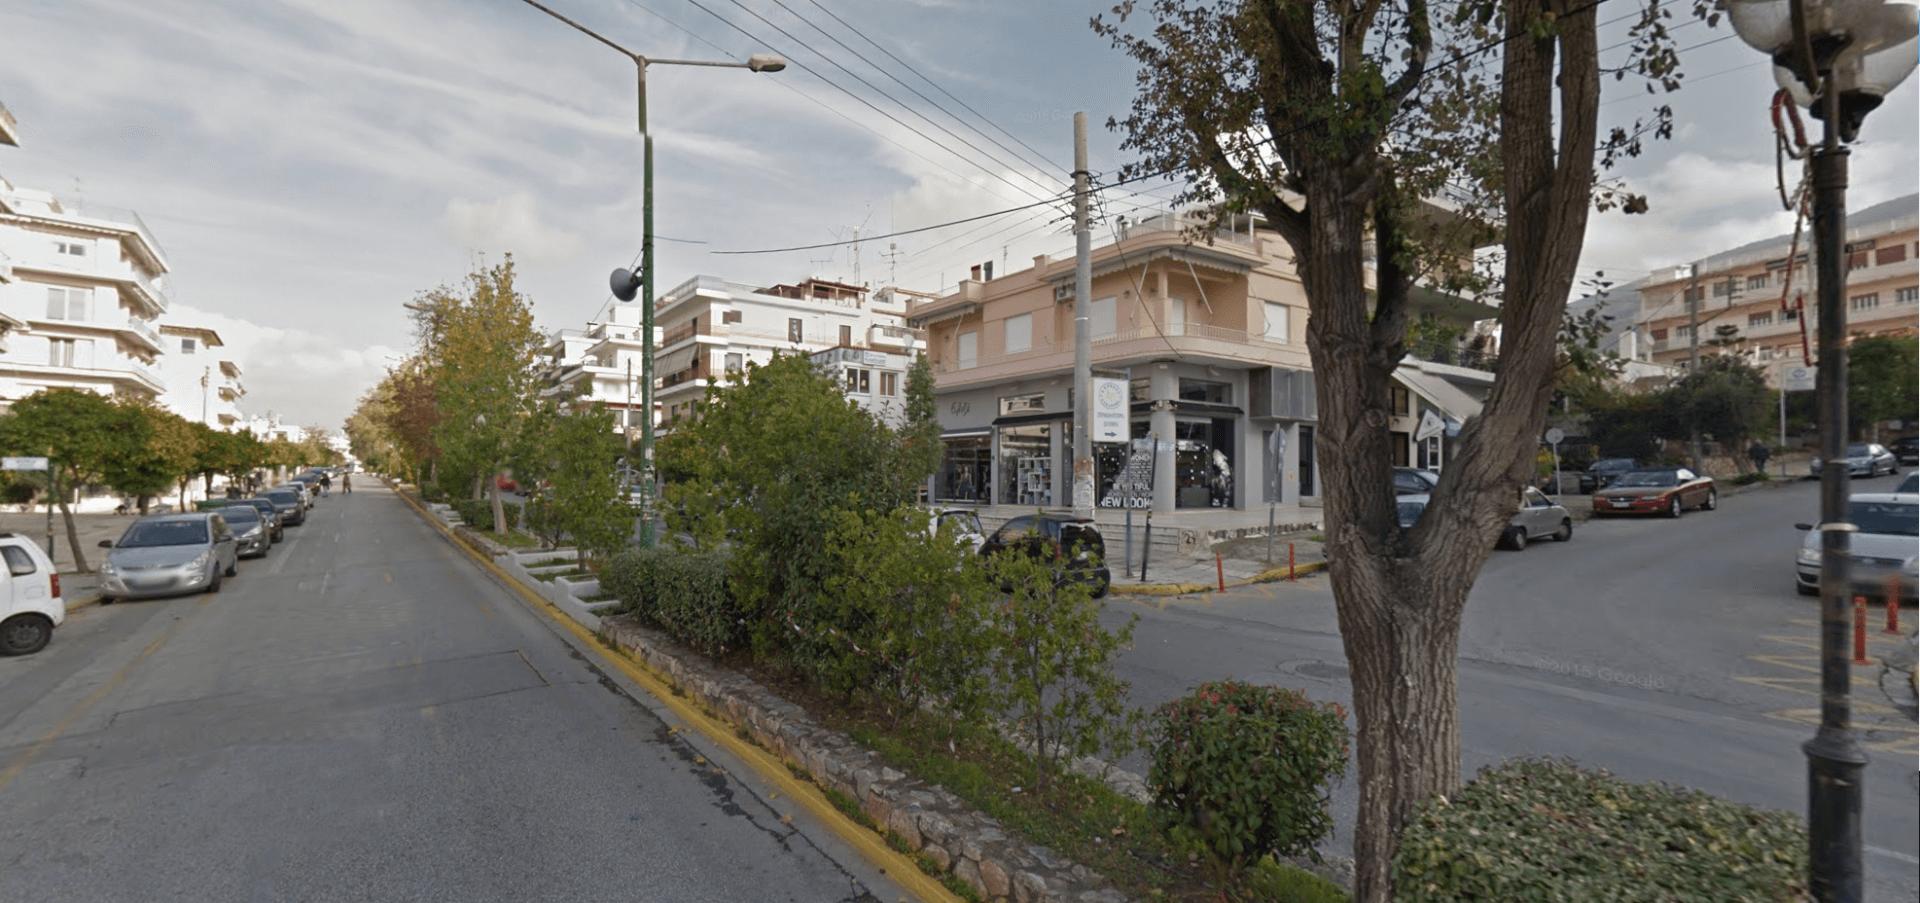 anaplasi leoforos eirinis Ποια Μεγάλα Έργα Περιλαμβάνει Το Τεχνικό Πρόγραμμα Του Δήμου Ηλιούπολης Για Το 2020